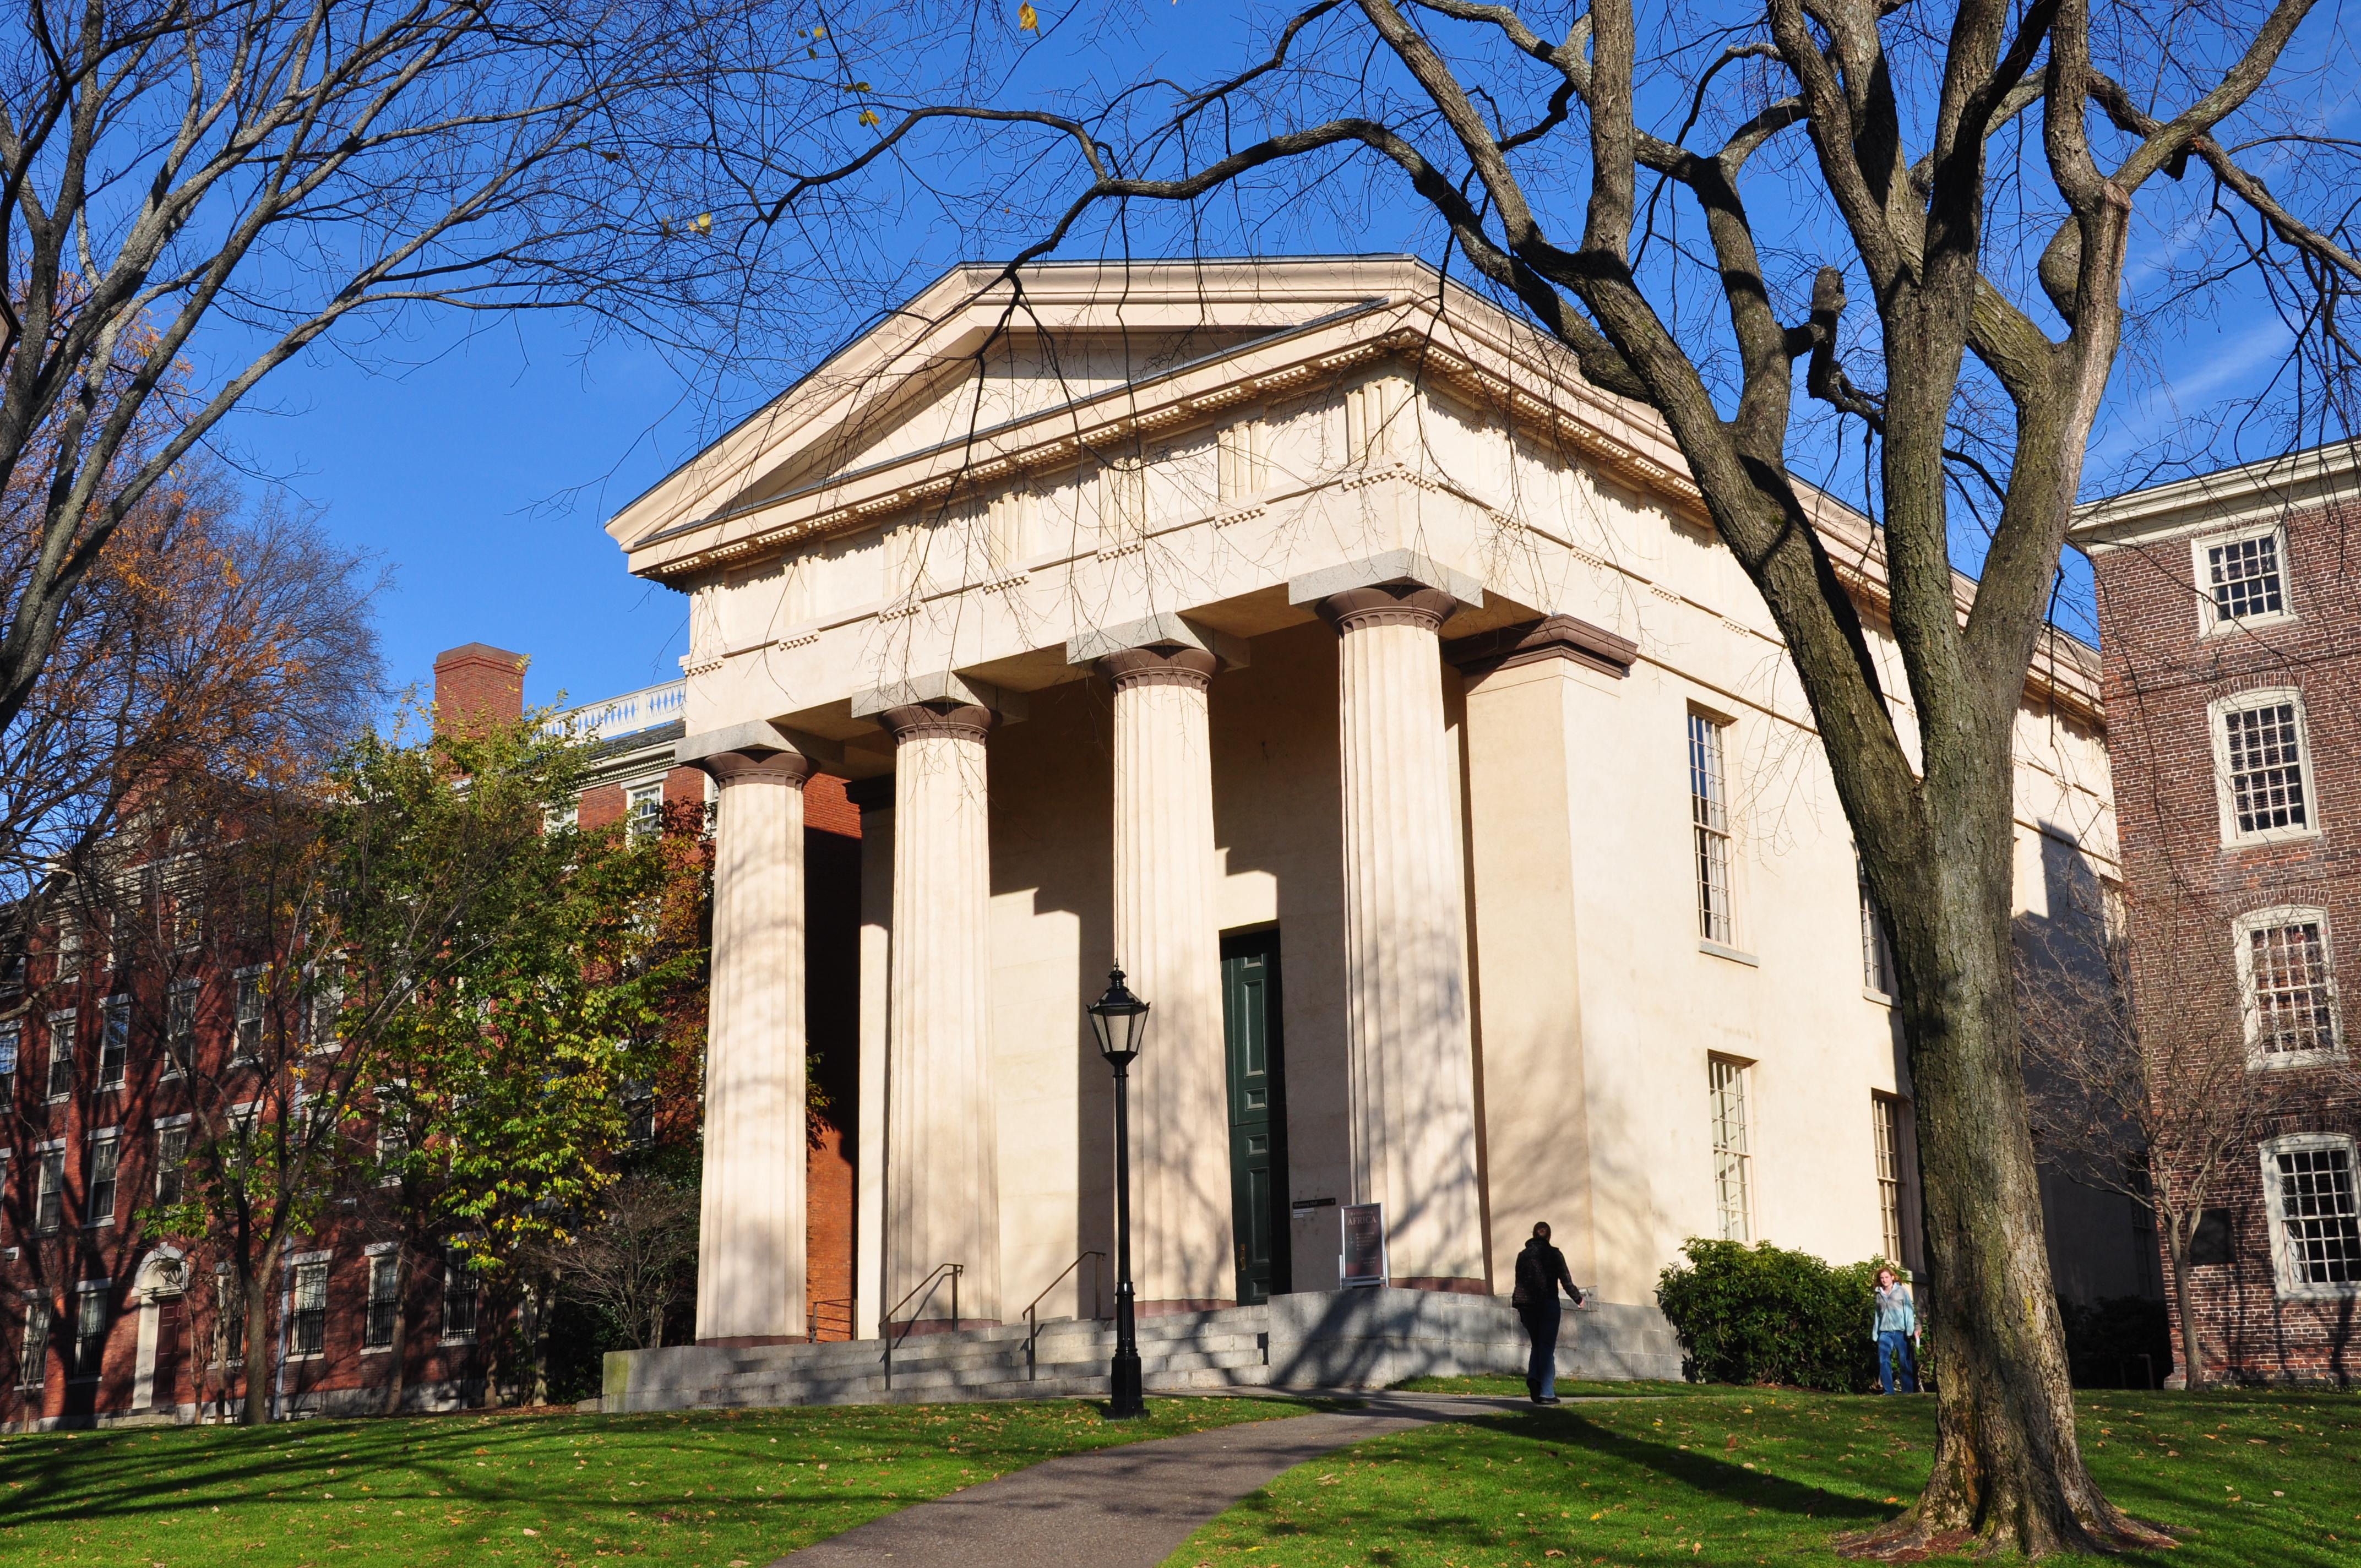 filemanning hall brown university providence rhode